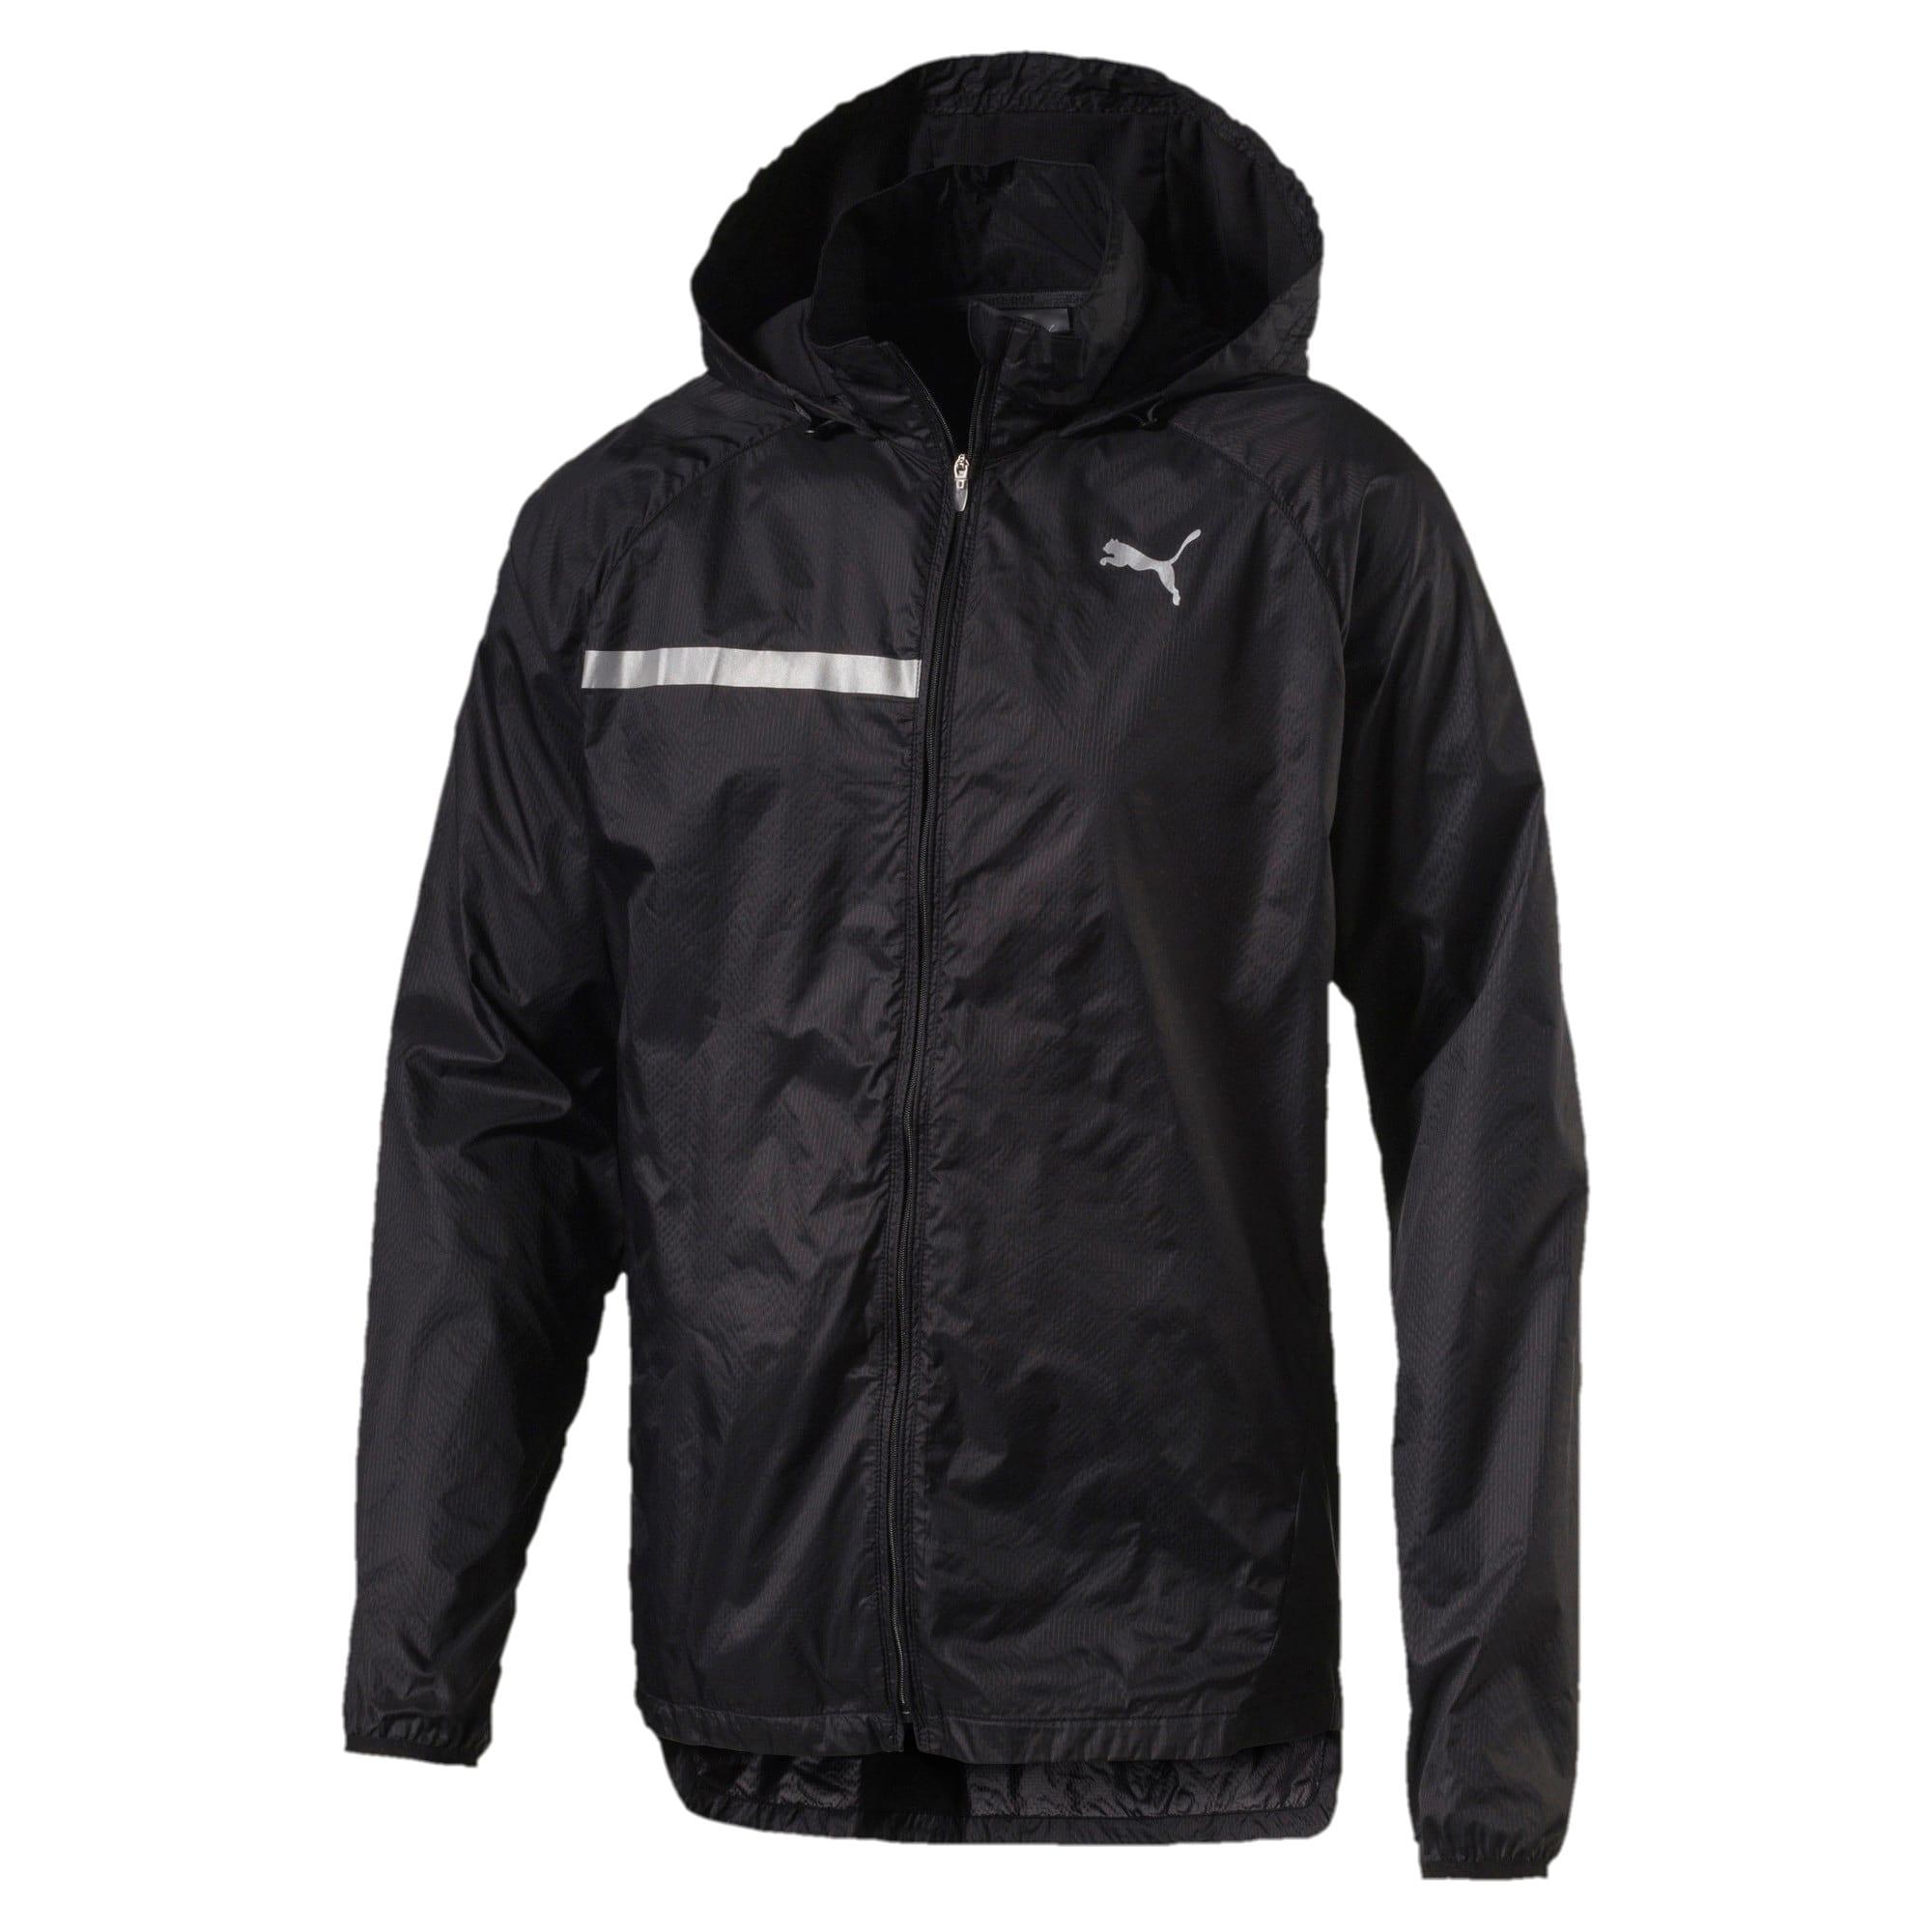 Thumbnail 1 of Lightweight Hooded Men's Jacket, Puma Black, medium